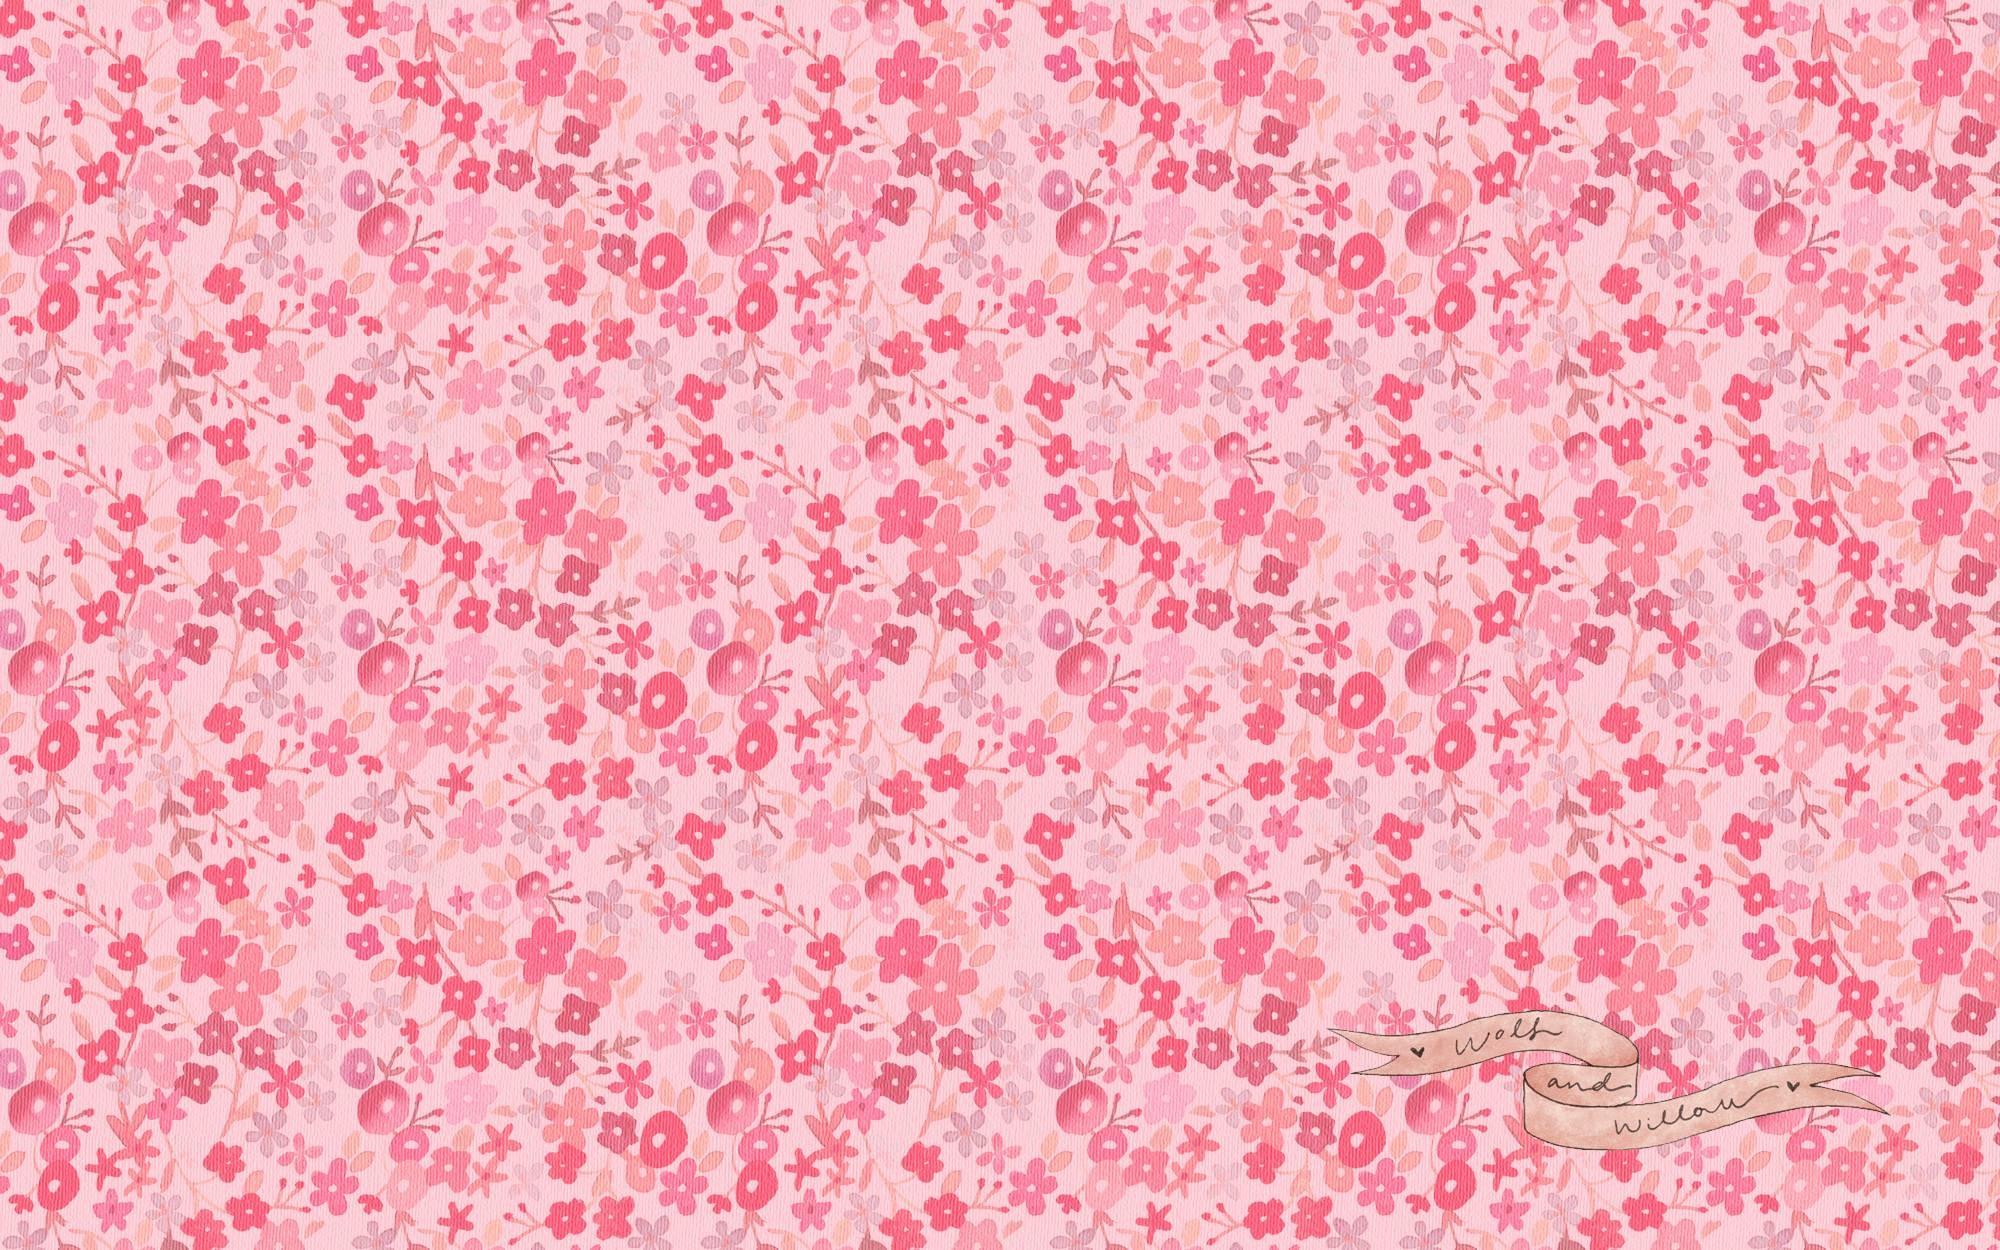 Pretty Desktop Backgrounds 927 Full HD Wallpaper Desktop – Res .